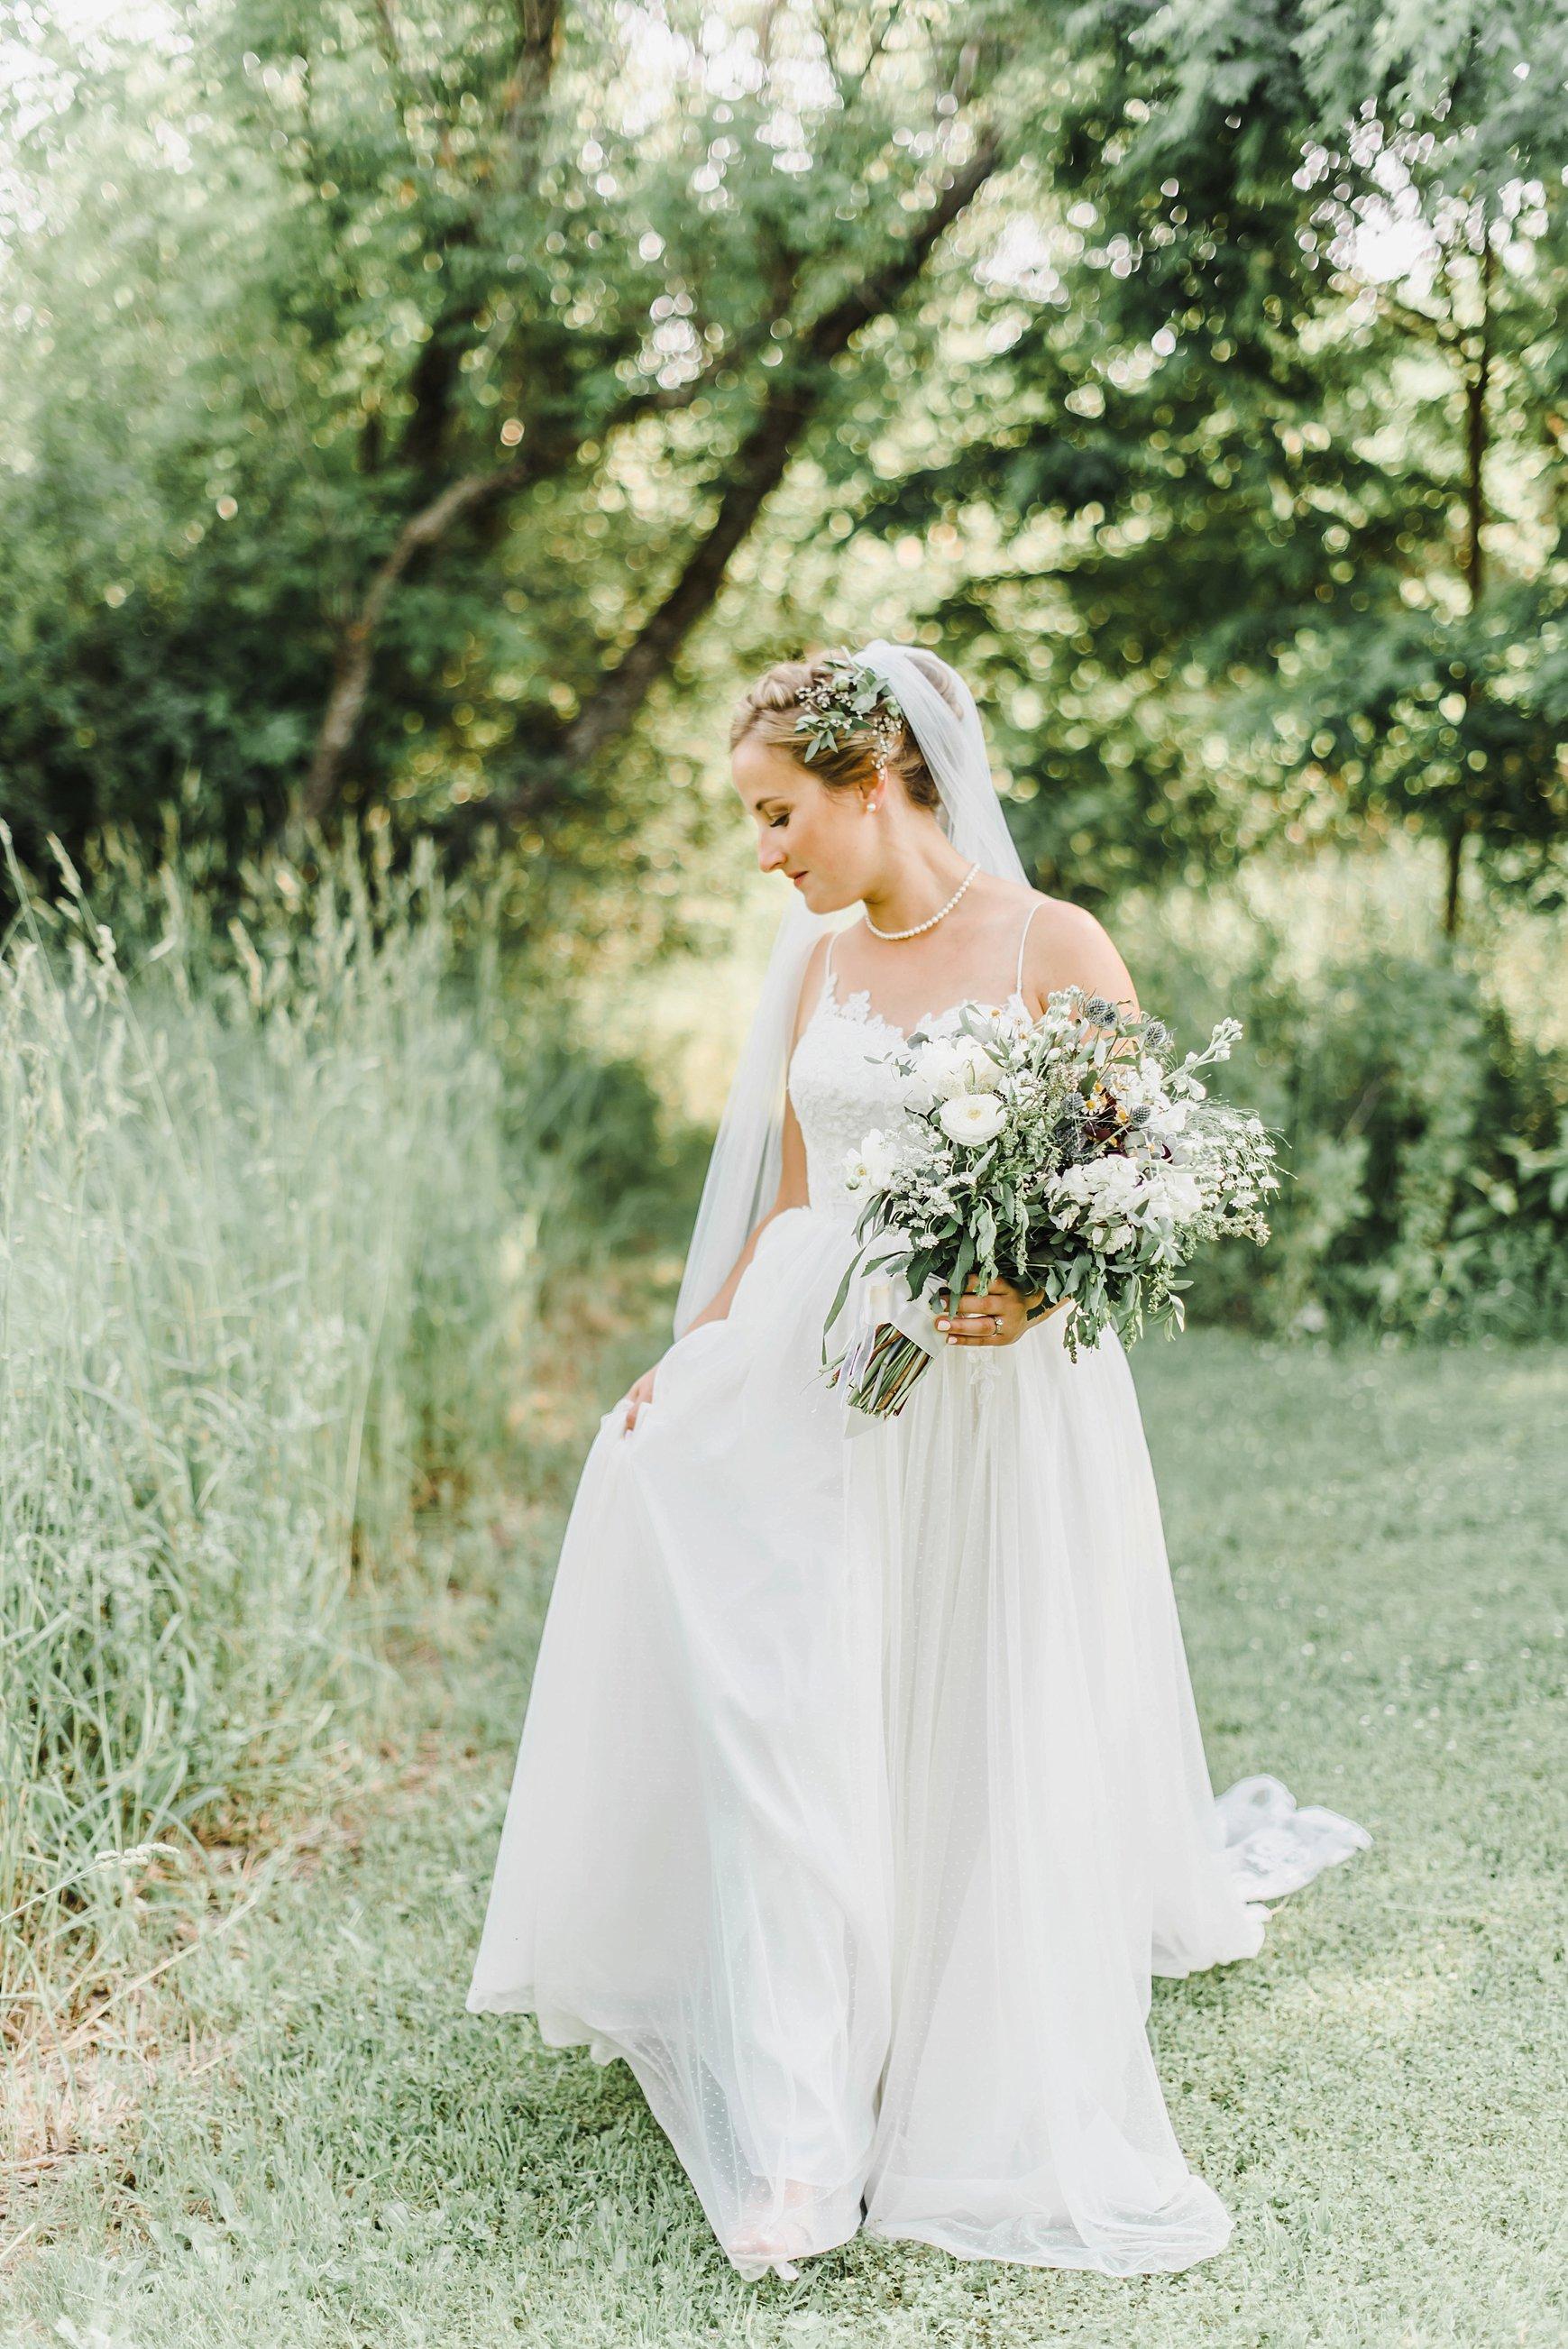 light airy indie fine art ottawa wedding photographer | Ali and Batoul Photography_0839.jpg